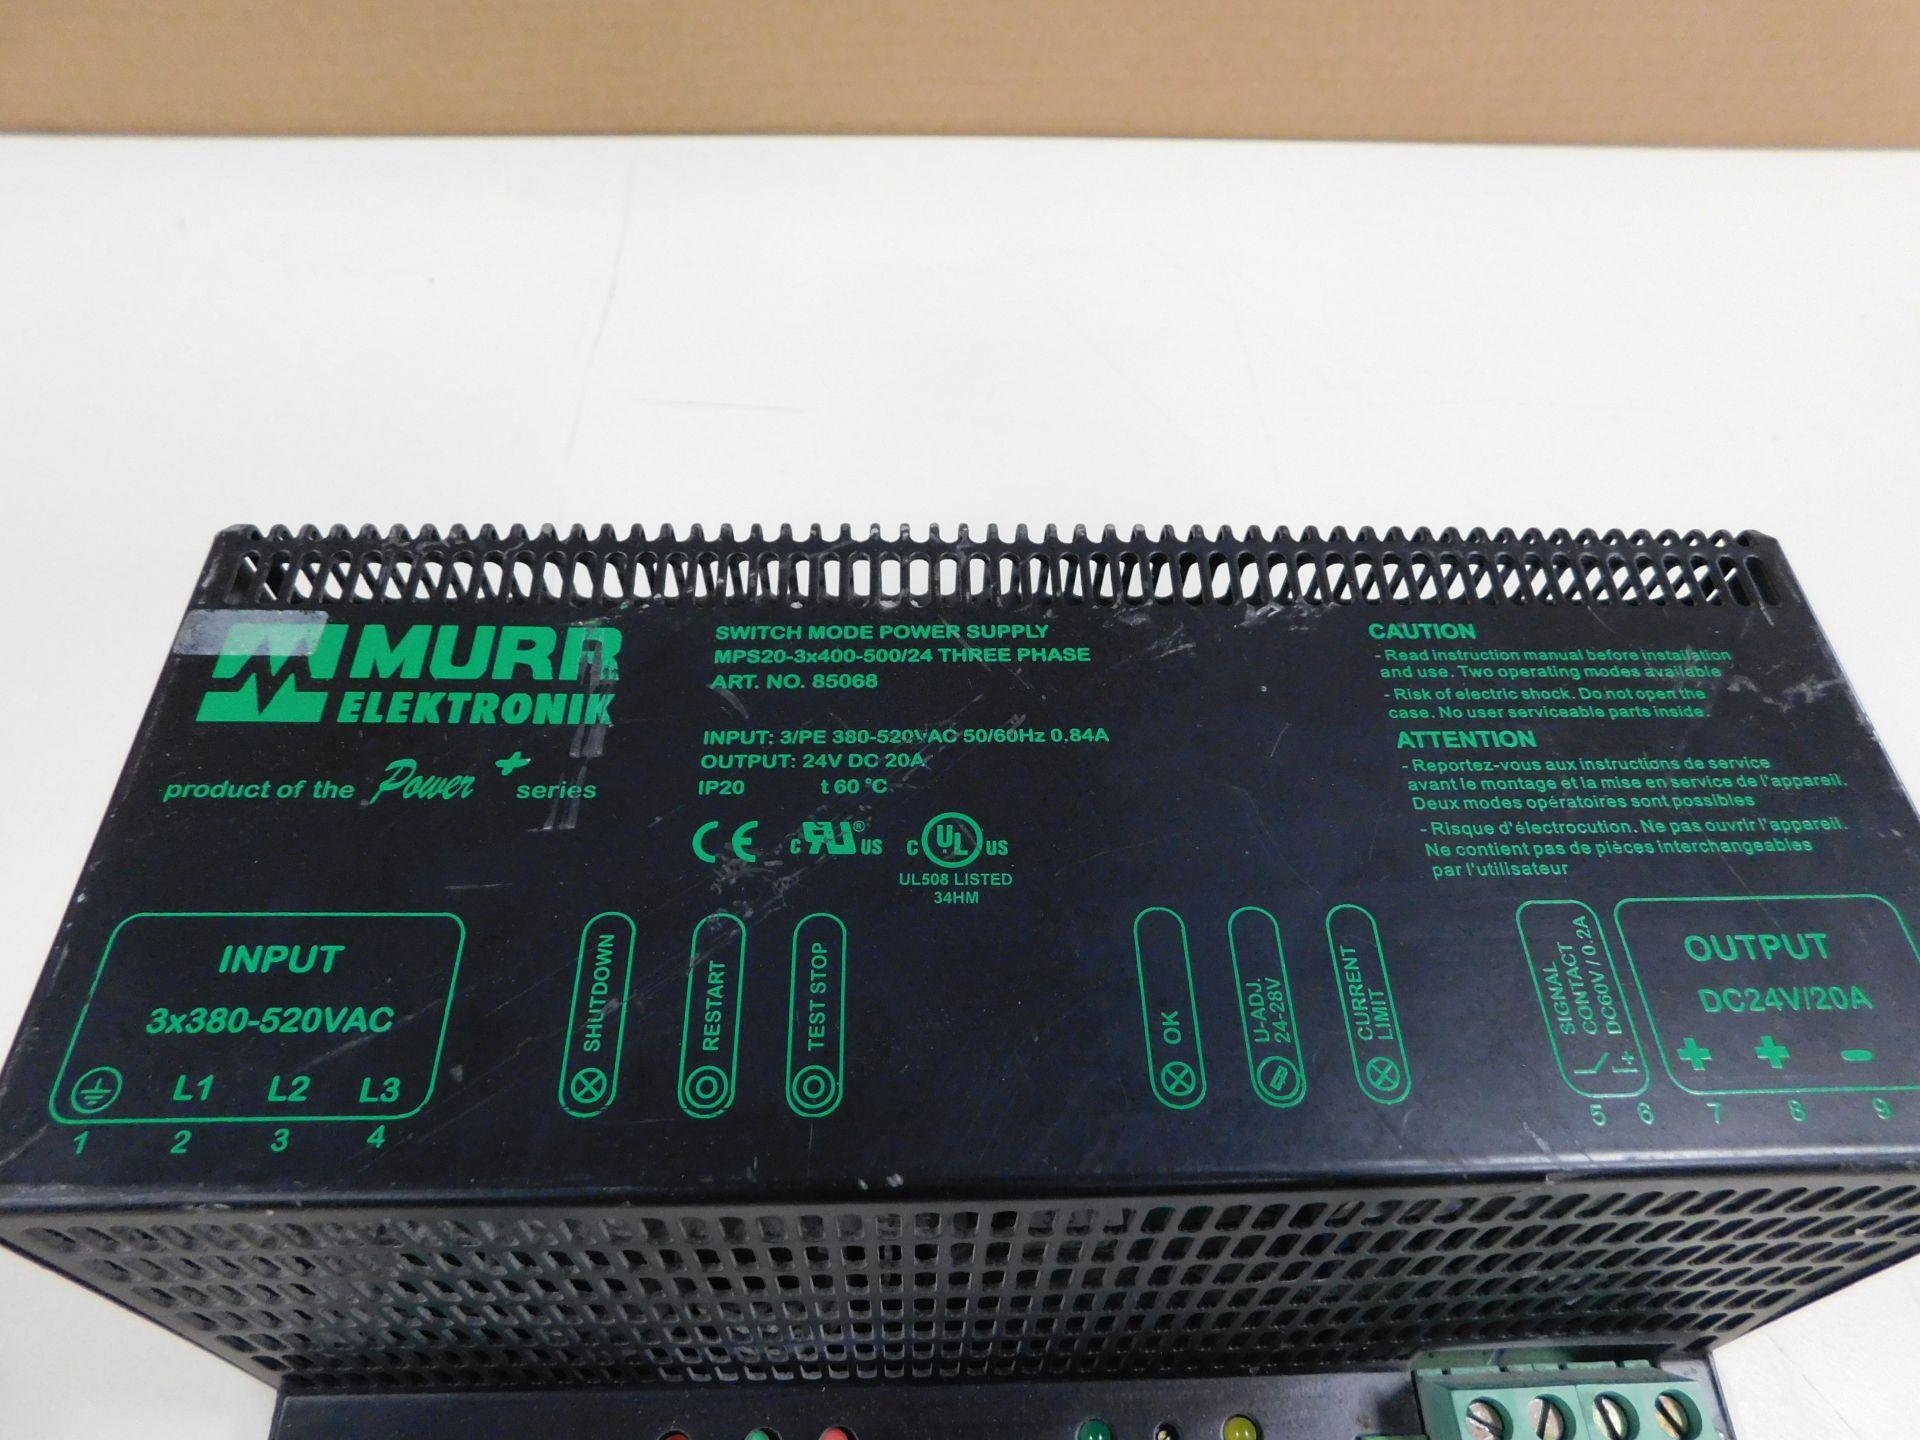 MURR ELEKTRONIC MPS20-3X400-500/24 - Image 2 of 4